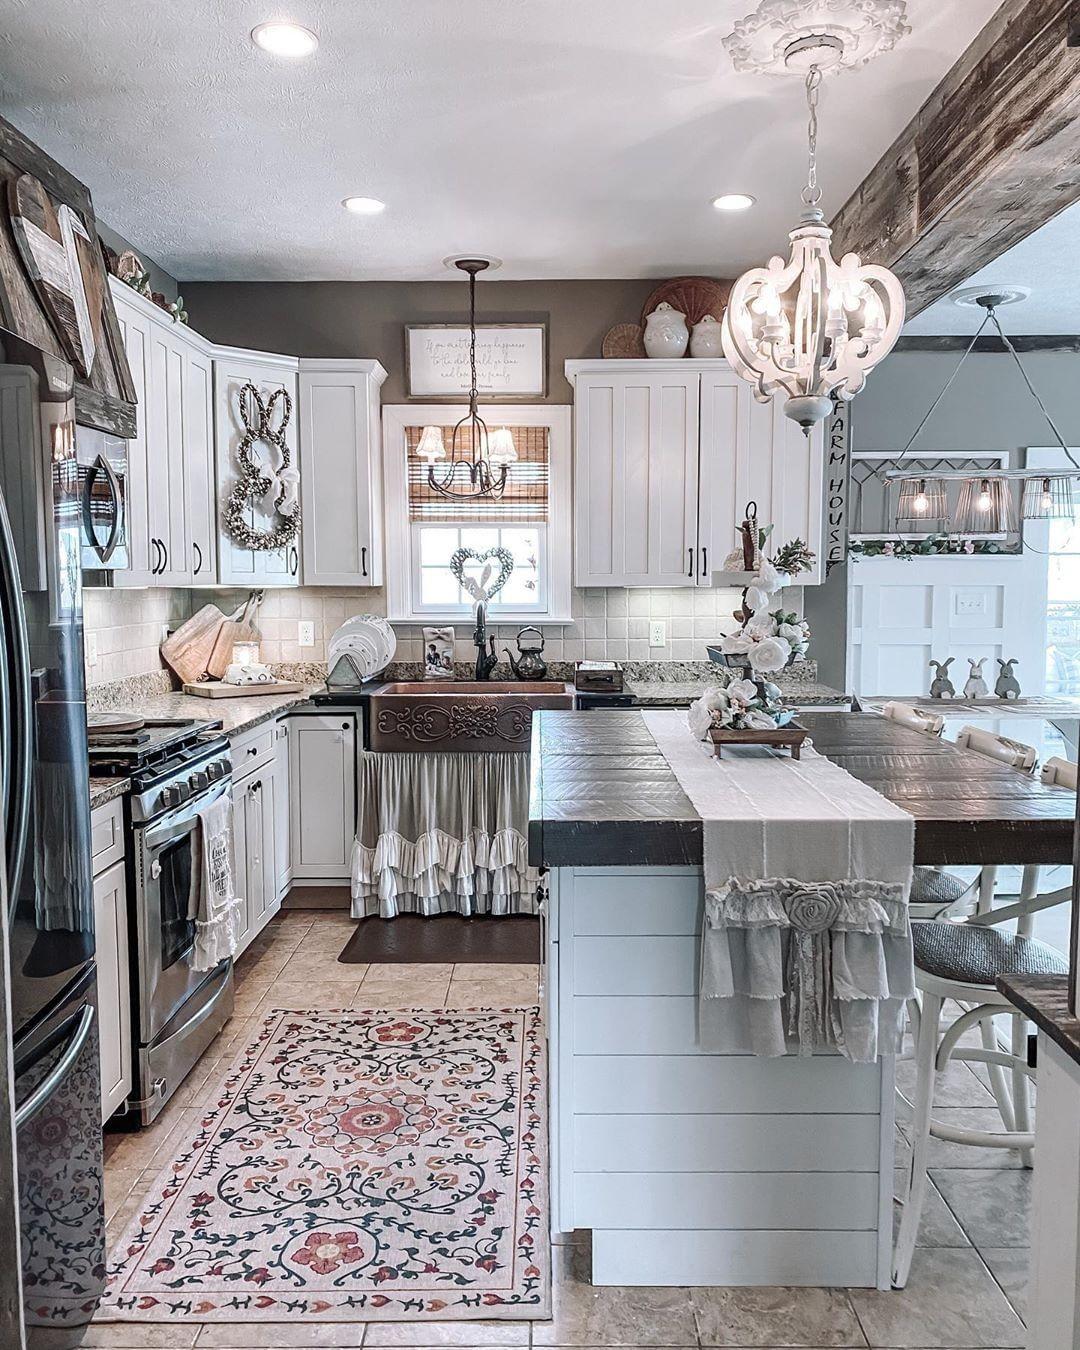 Countryhome Interior Design: Board And Batten Siding Blog